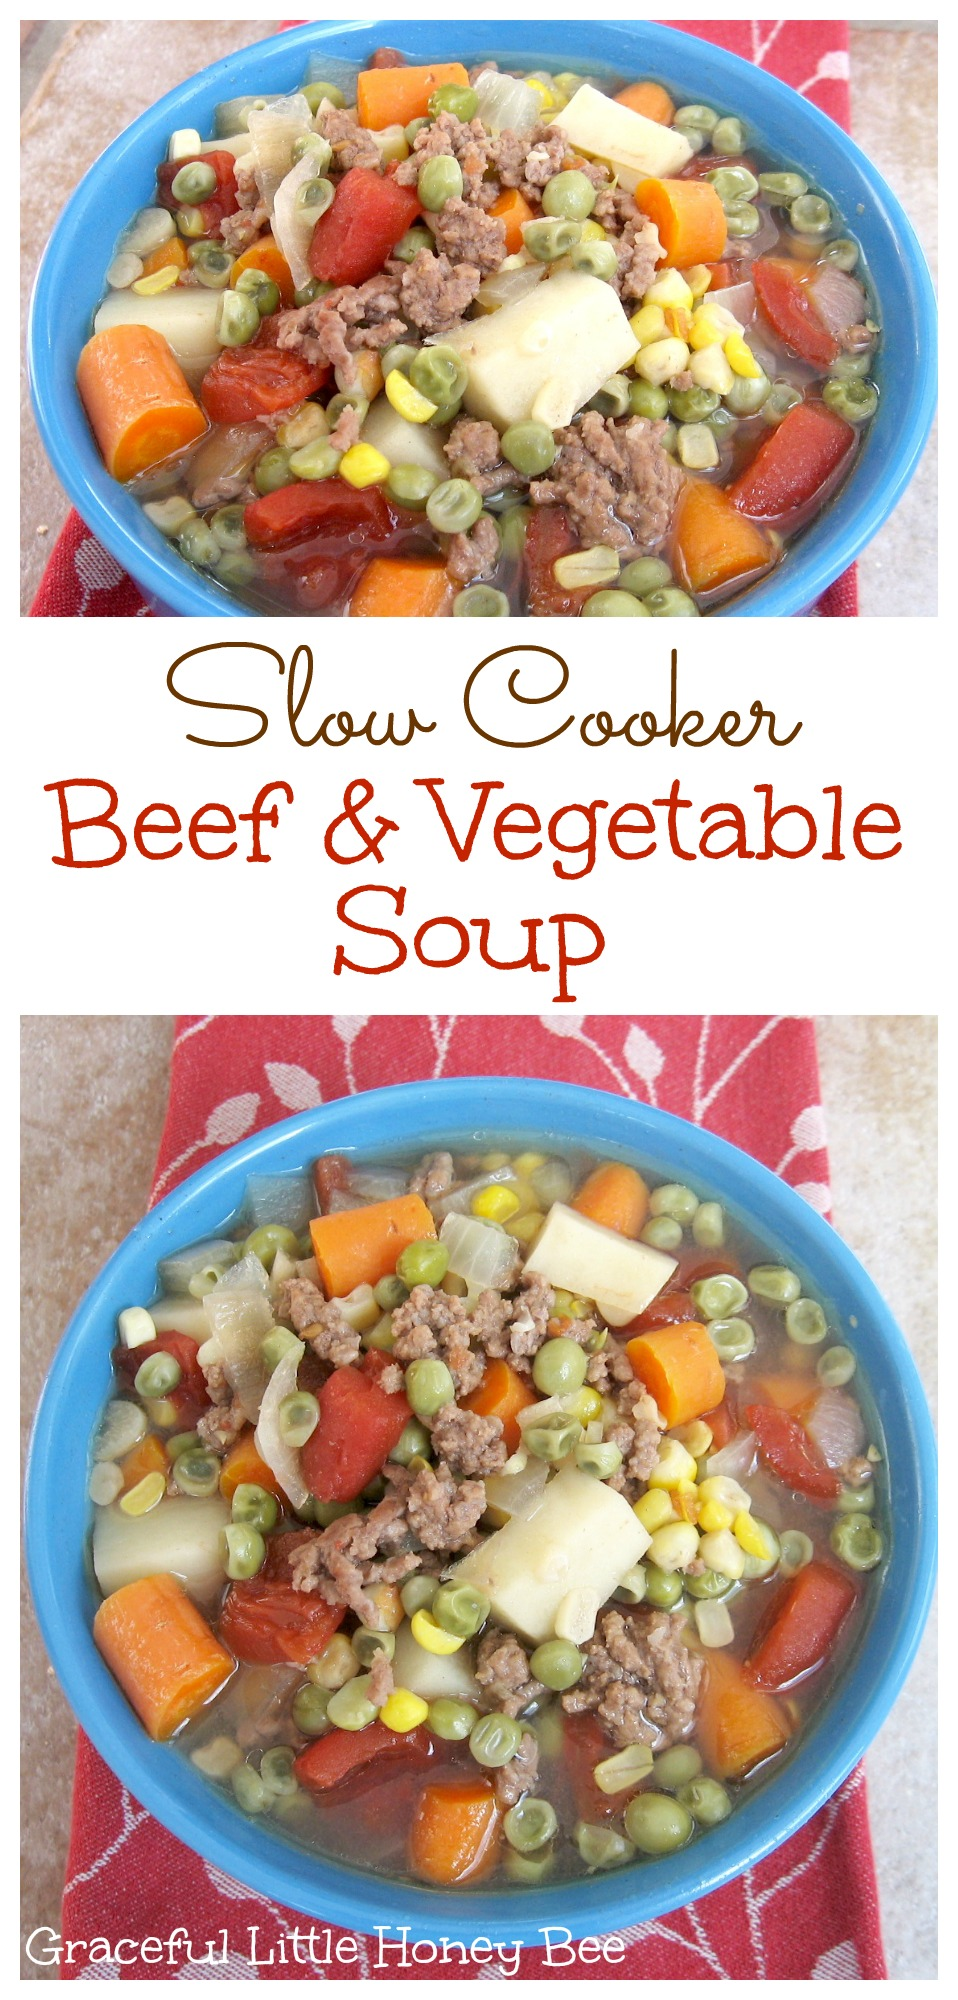 Slow-Cooker-Beef-Vegetable-Soup.jpg